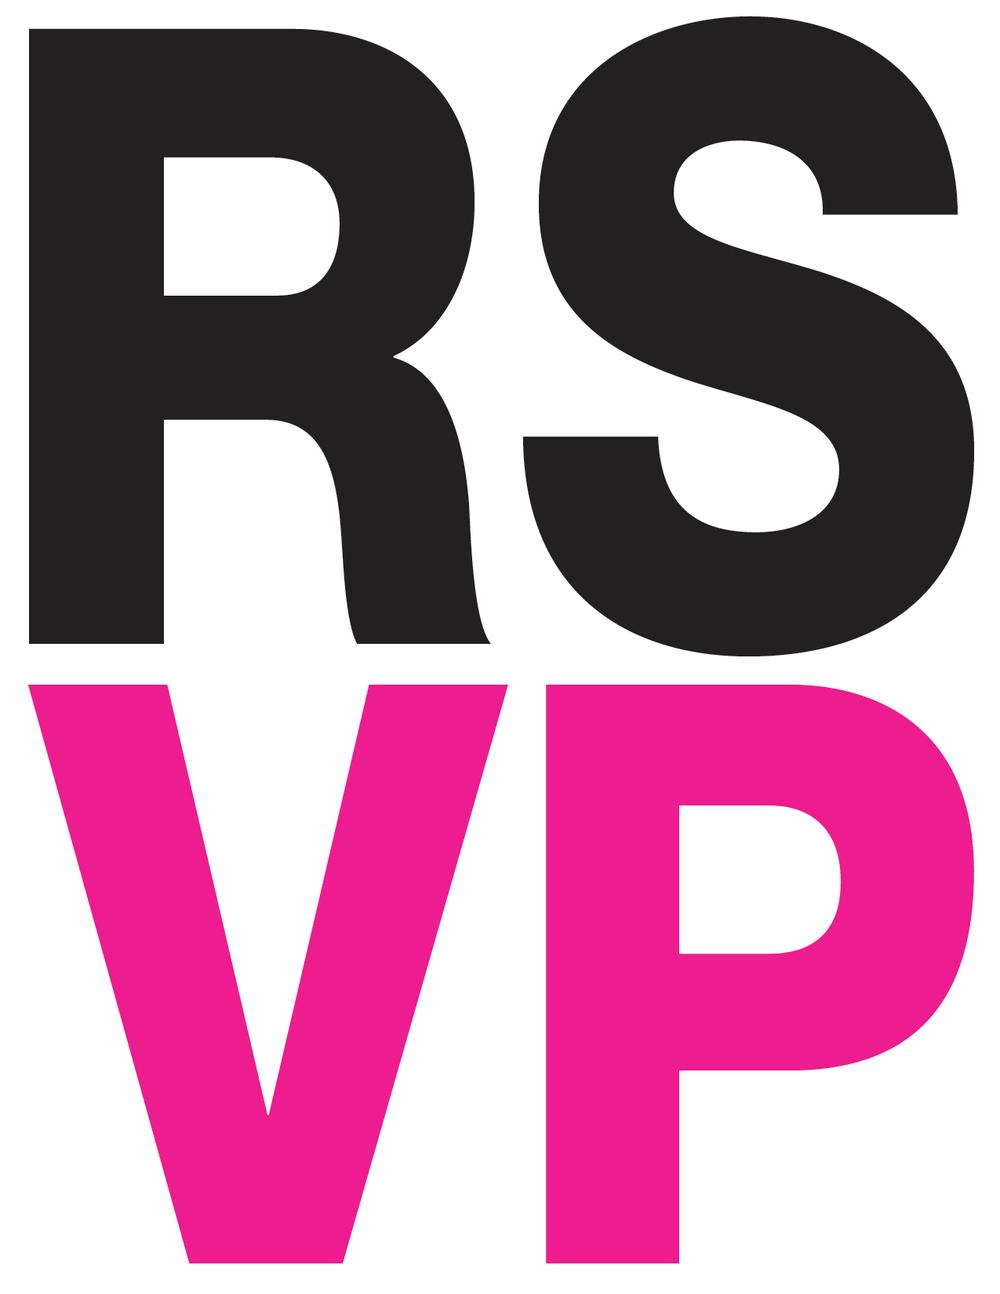 Salon 2009 Invitation - RSVP - Front